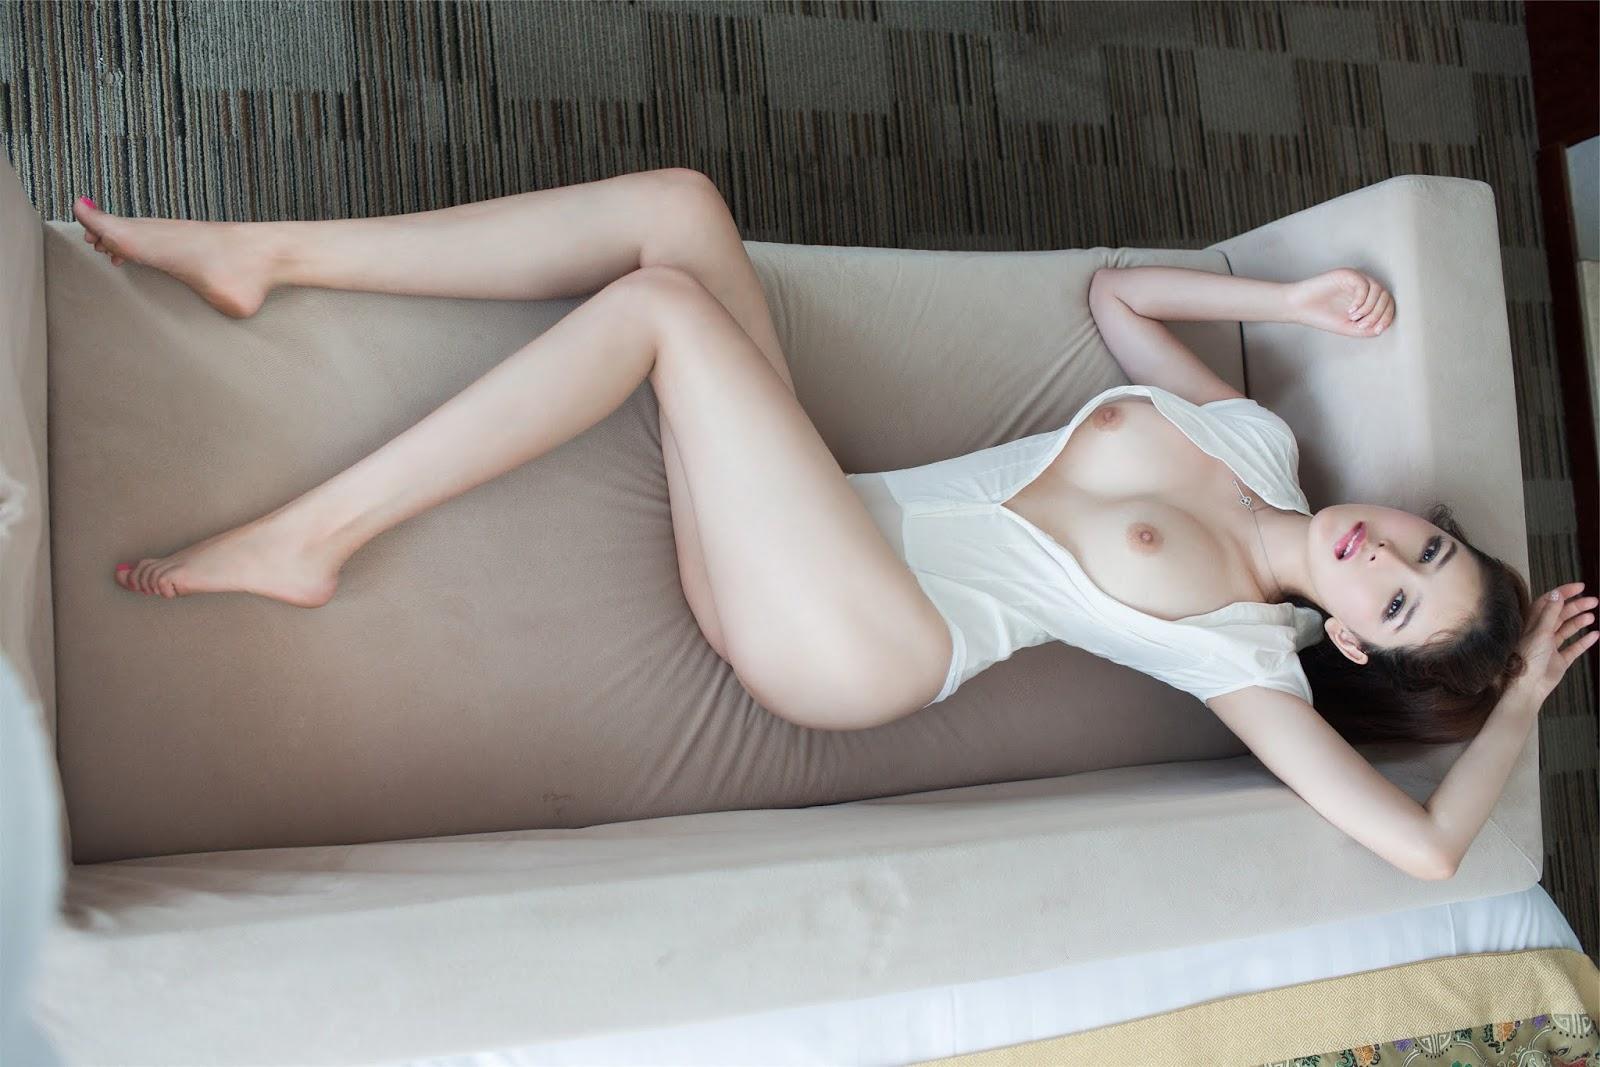 BoolWowGirls%2B%252815%2529 - Li LiSha 李丽莎 Beautiful Nude Model